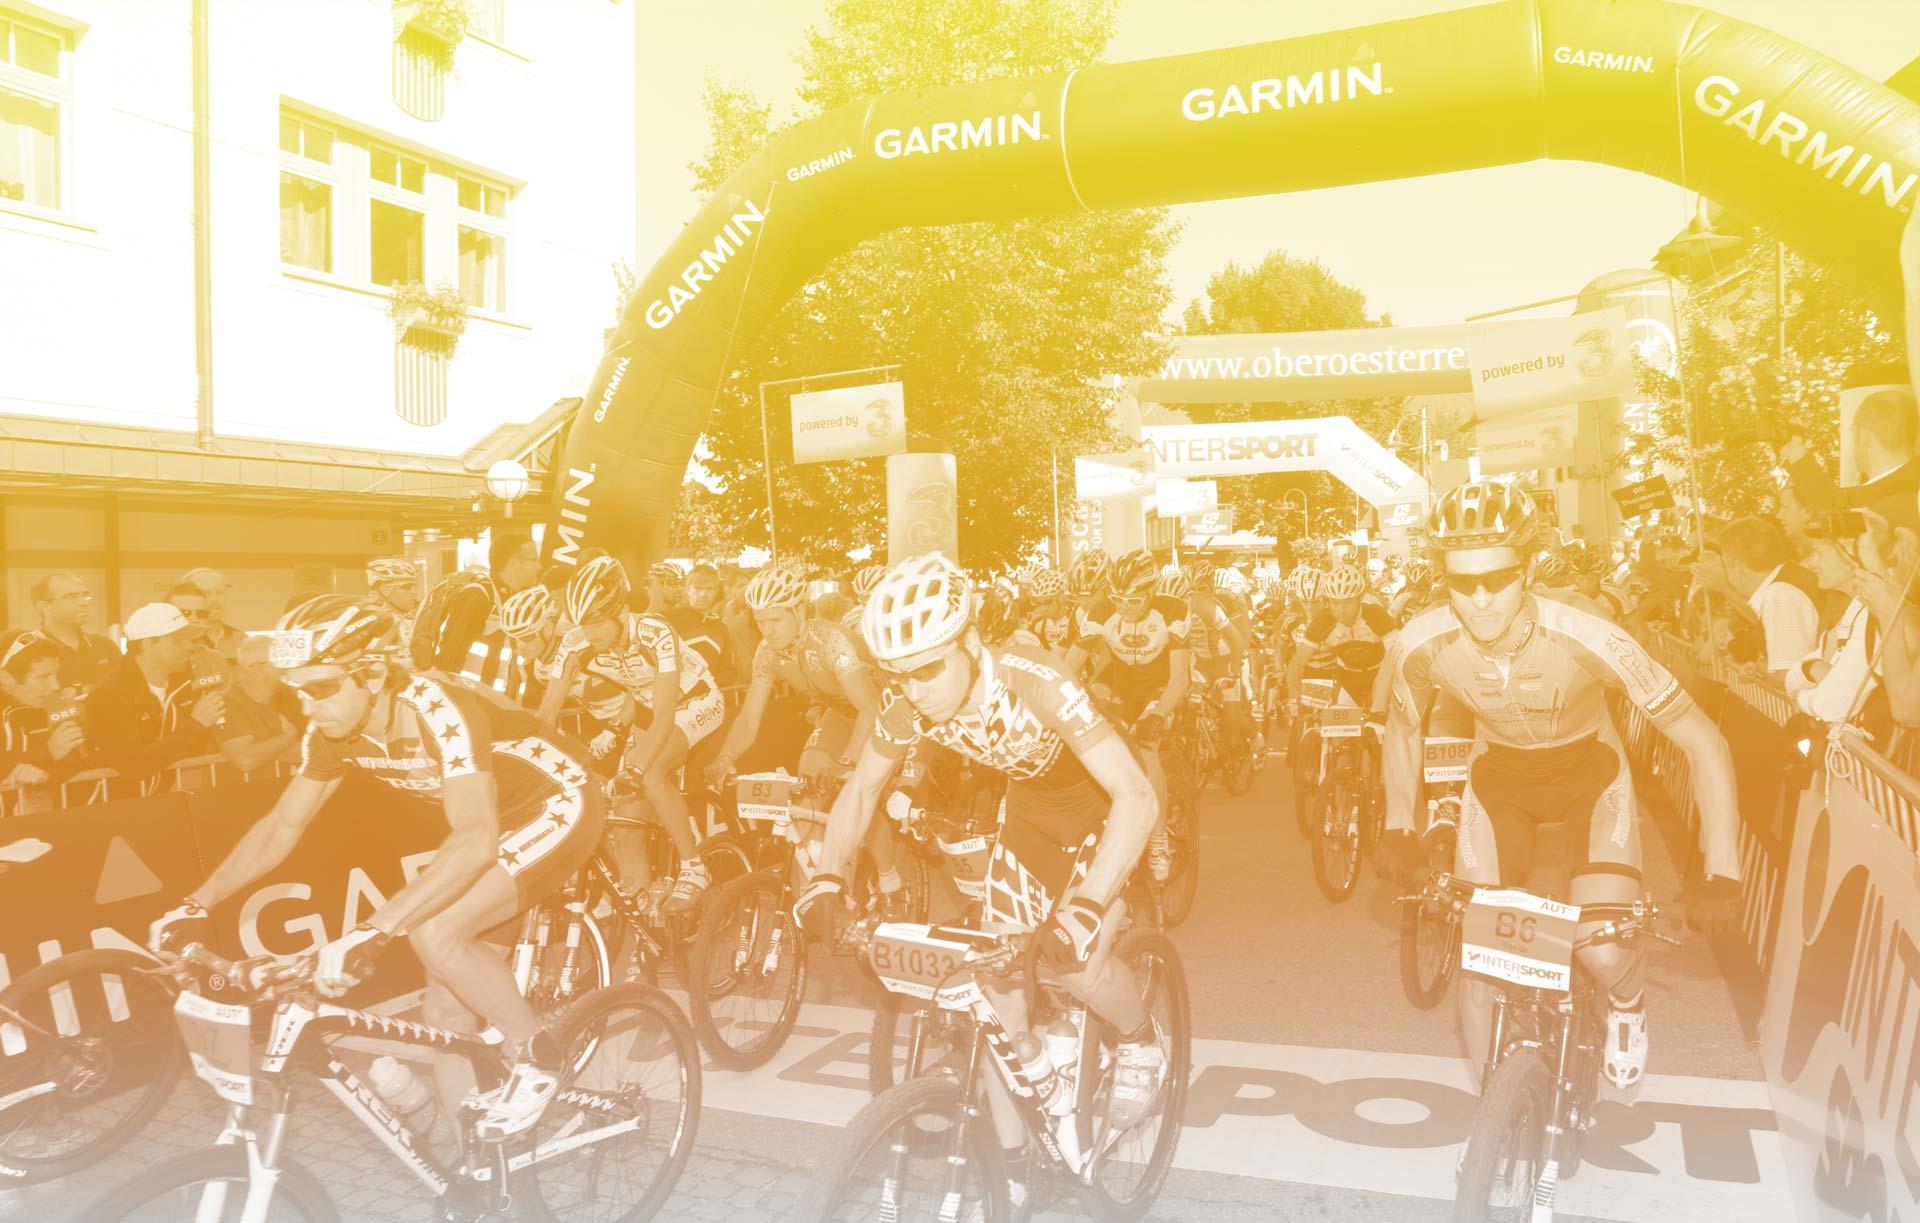 Salzkammergut Mountainbike Trophy  Österreichs größter